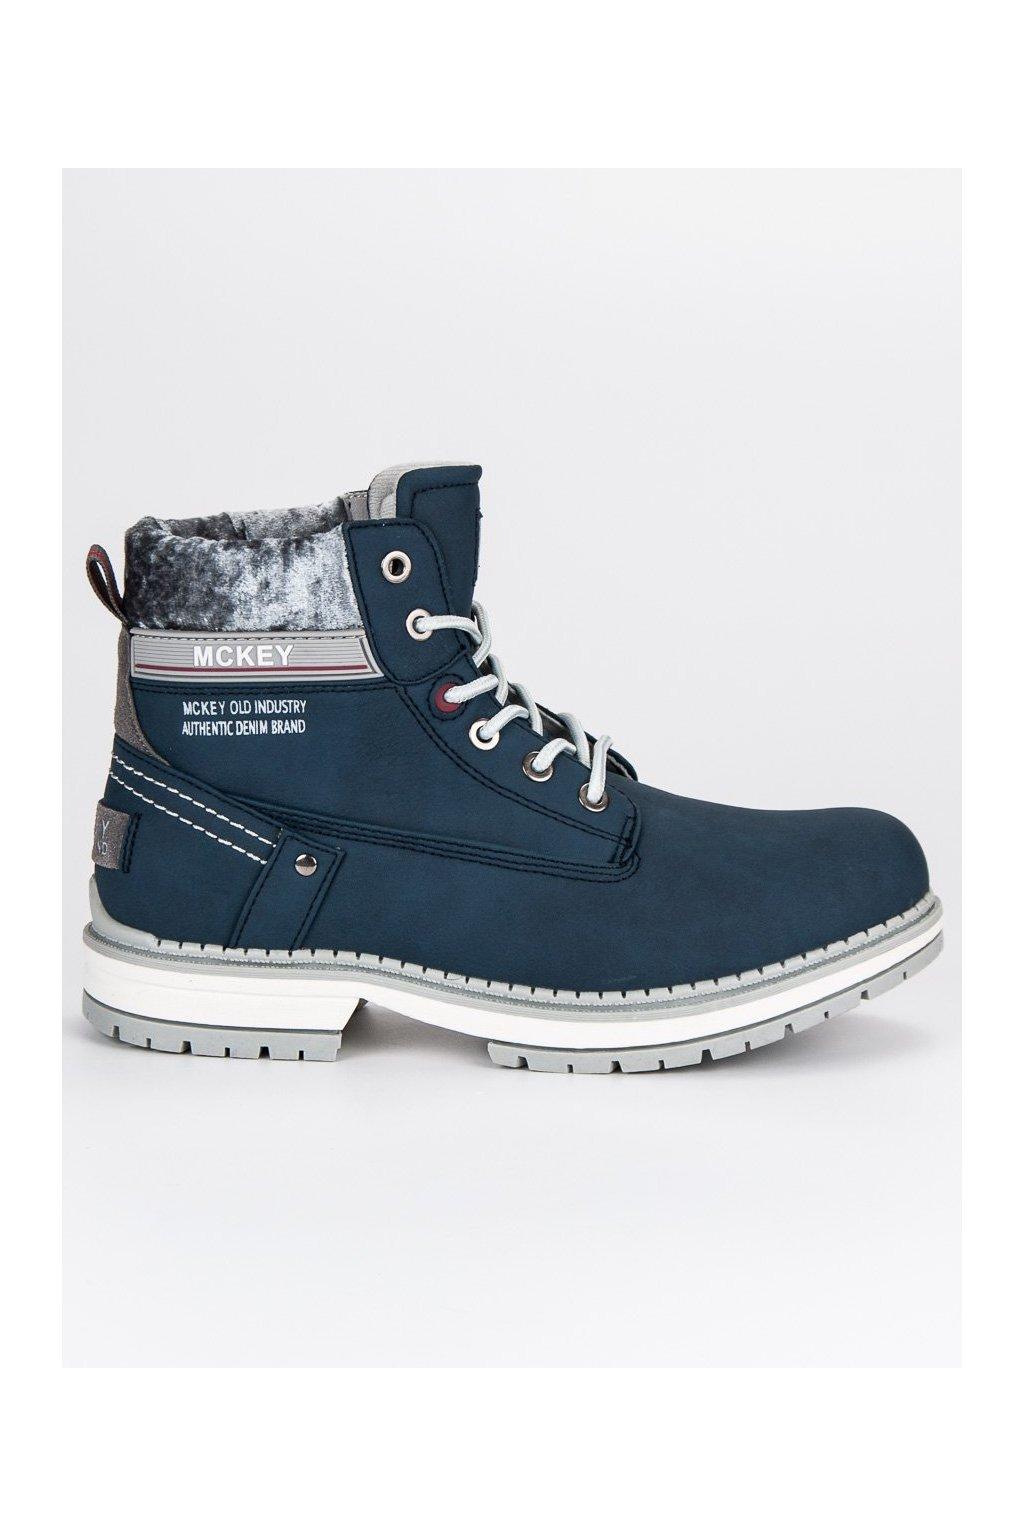 55ecb39f74198 1037663_pohodlne-damske-topanky-na-zimu-modre-tr401-17n.jpg?5bc5da4a